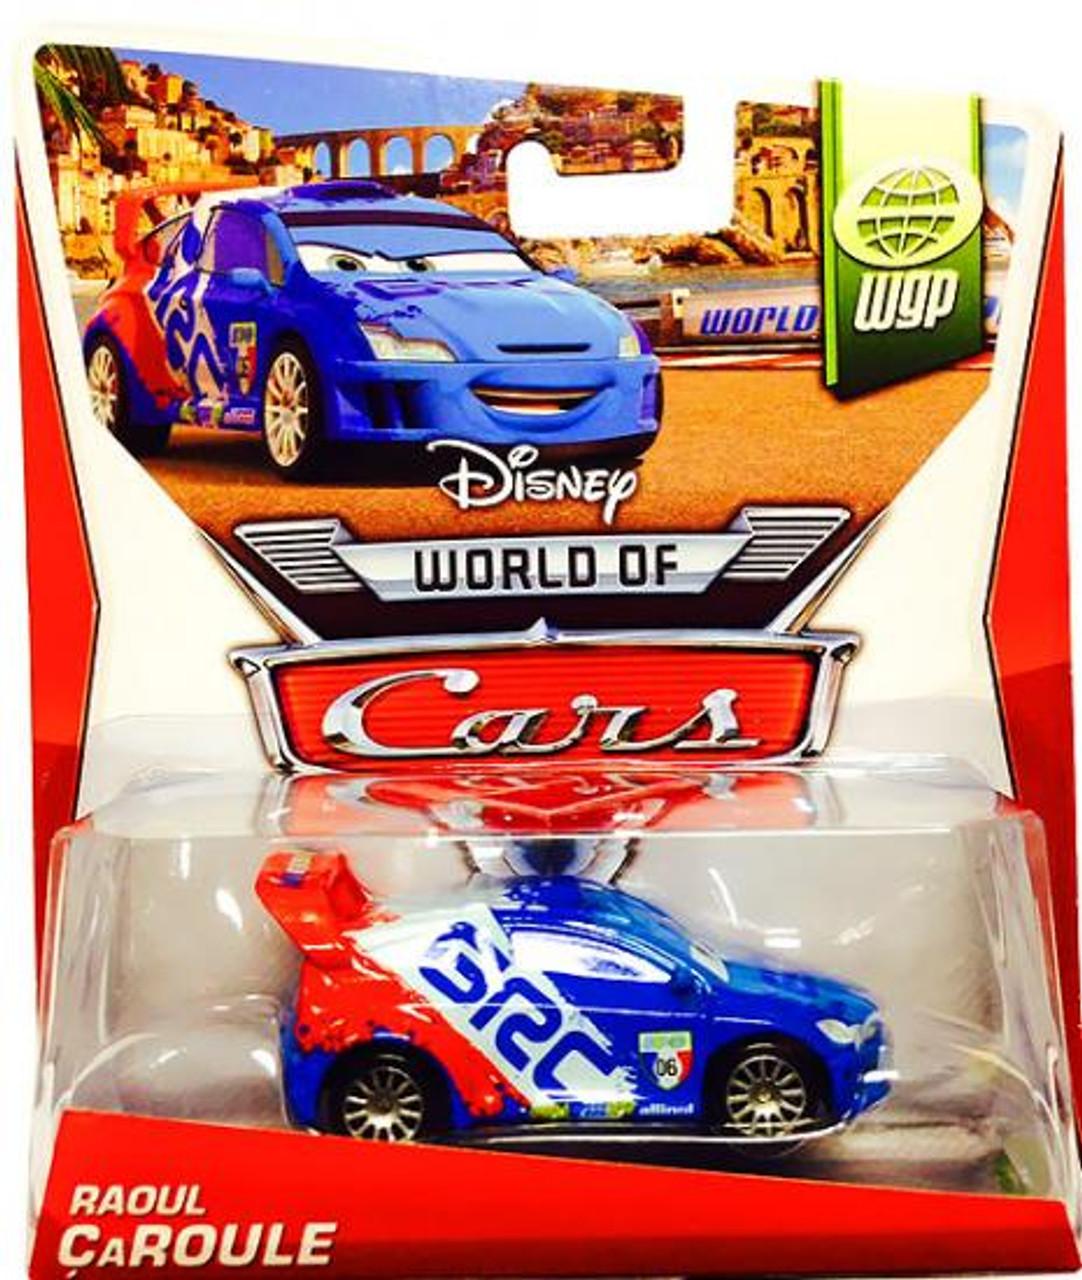 Disney Cars The World of Cars Series 2 Raoul Caroule Diecast Car